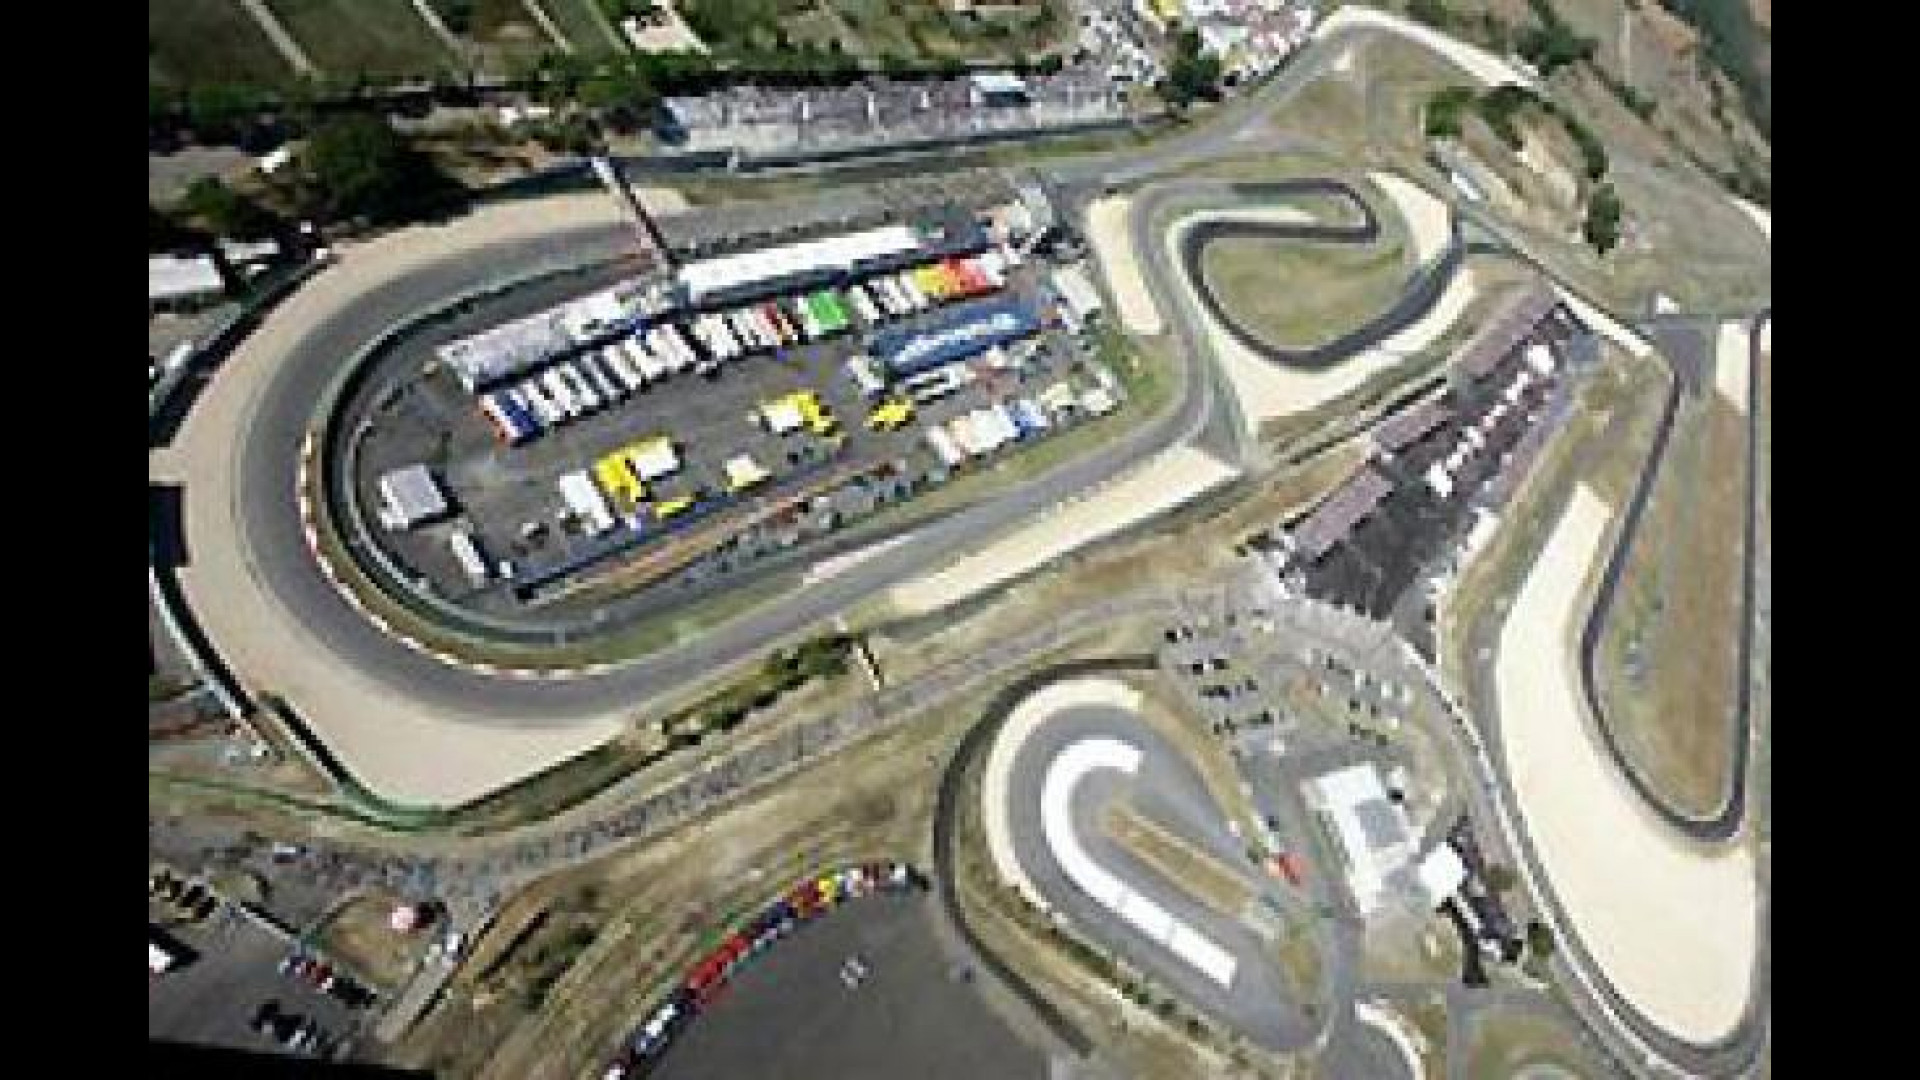 Circuito Vallelunga : Vallelunga bytetherapy btt motor sport